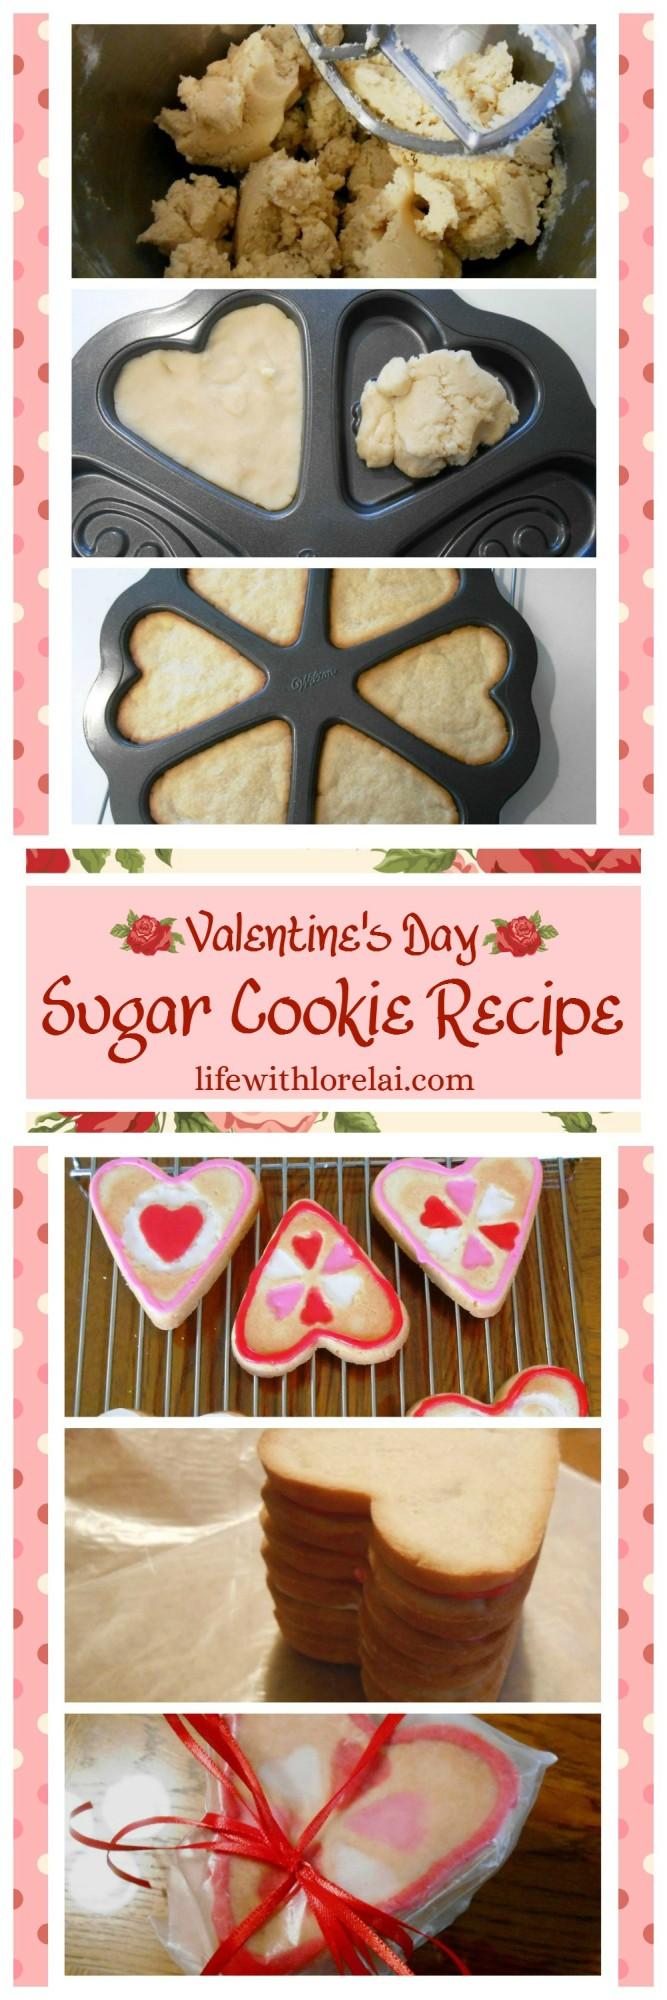 Valentine's Day Sugar Cookie Steps.Strip - Life With Lorelai